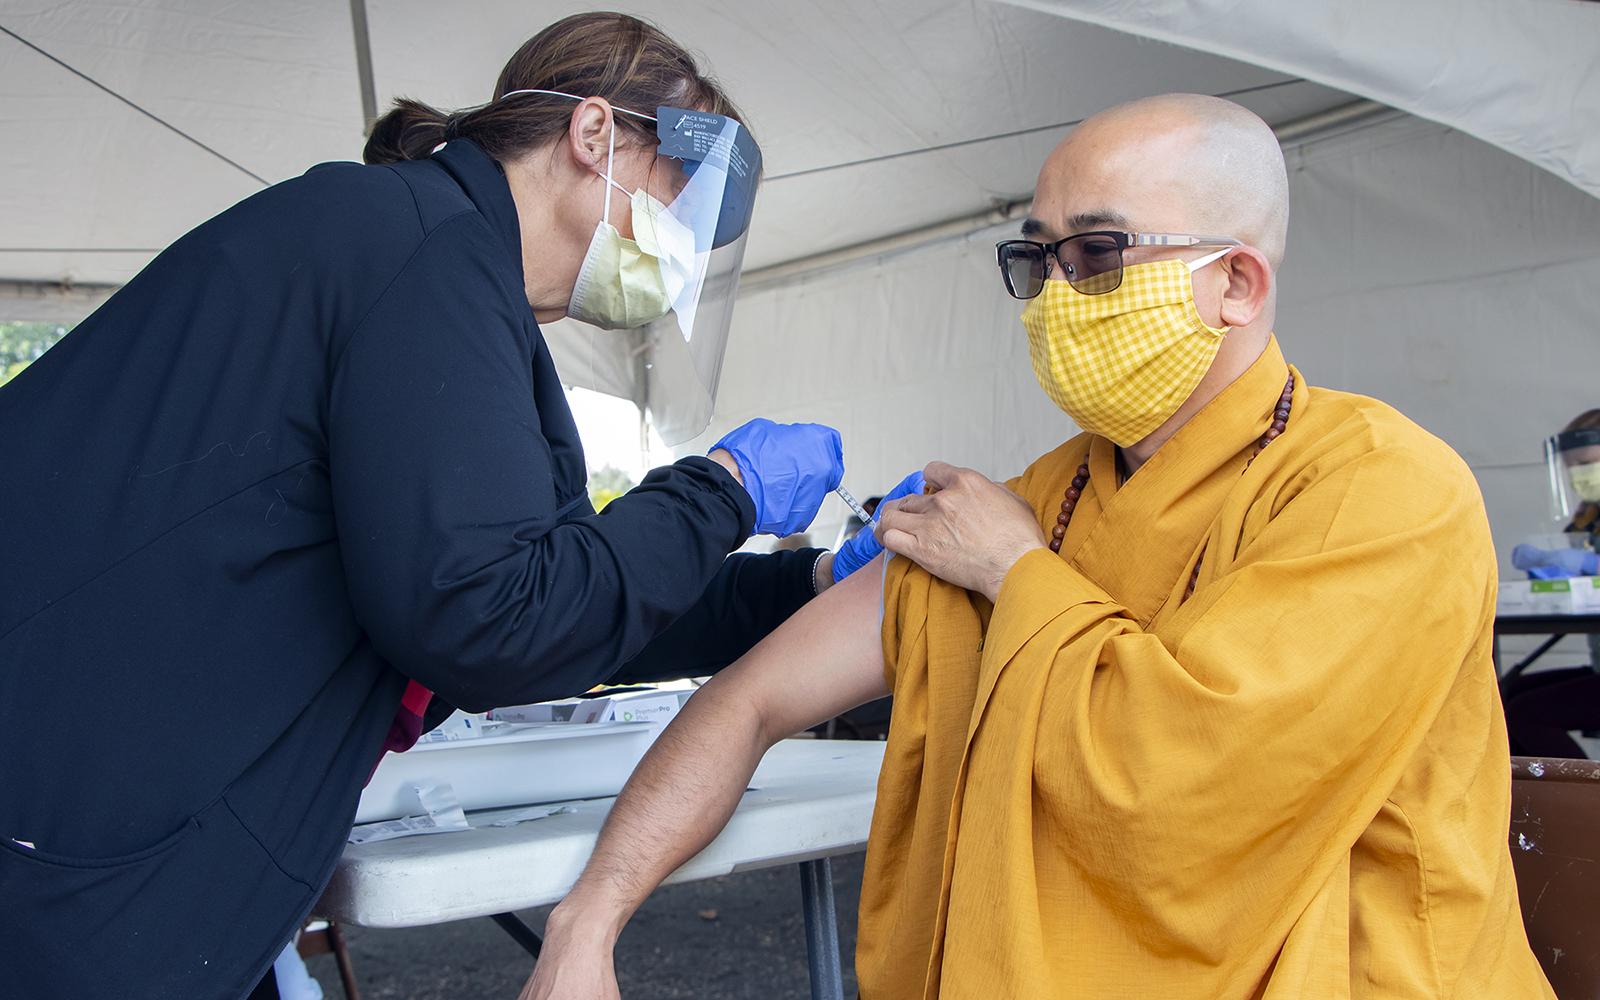 Mini Clinics Tackle Health Disparities One Flu Shot At A Time